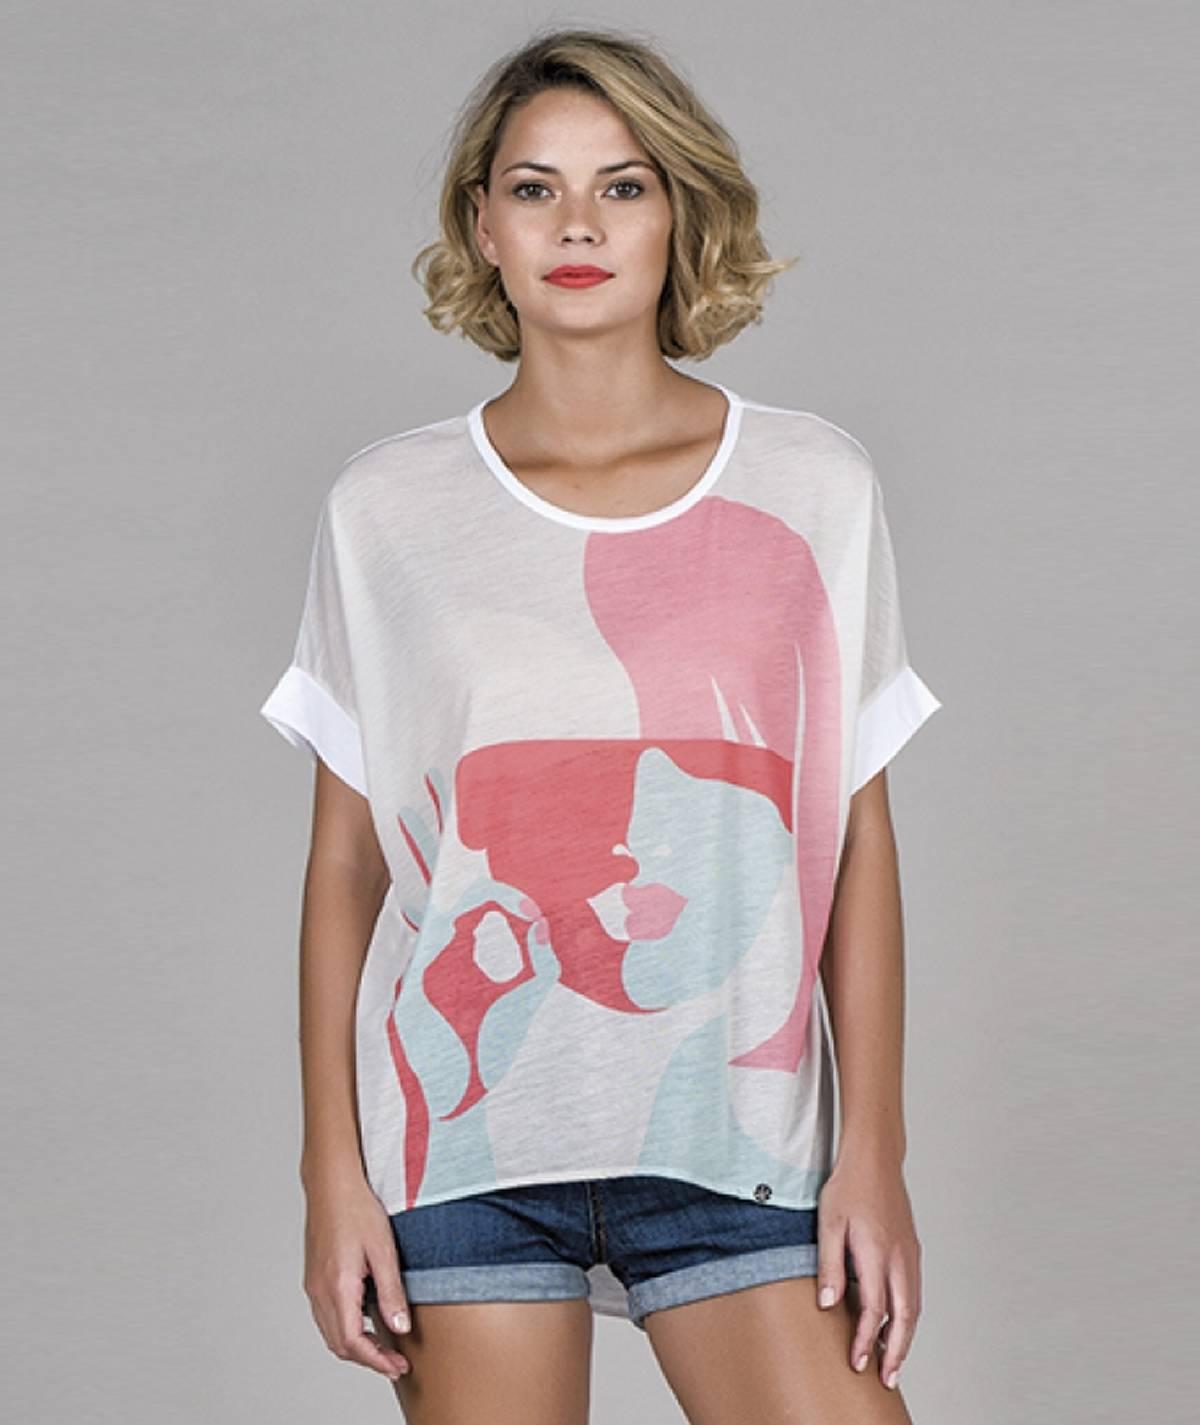 T-shirt motivo cara mulher